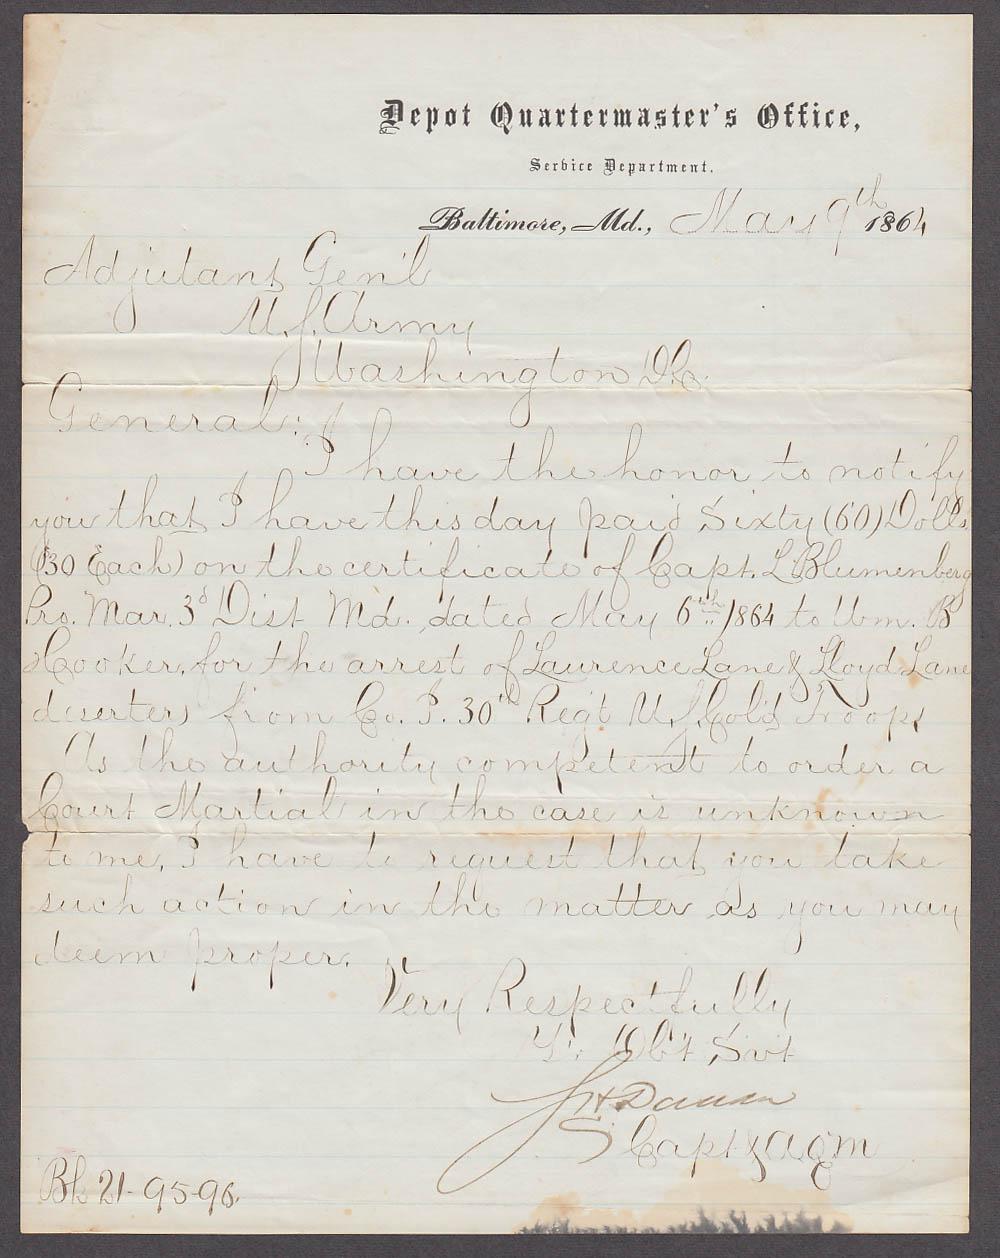 30th Regt Colored Troops Laurence & Lloyd Lane deserters bounty document 1864